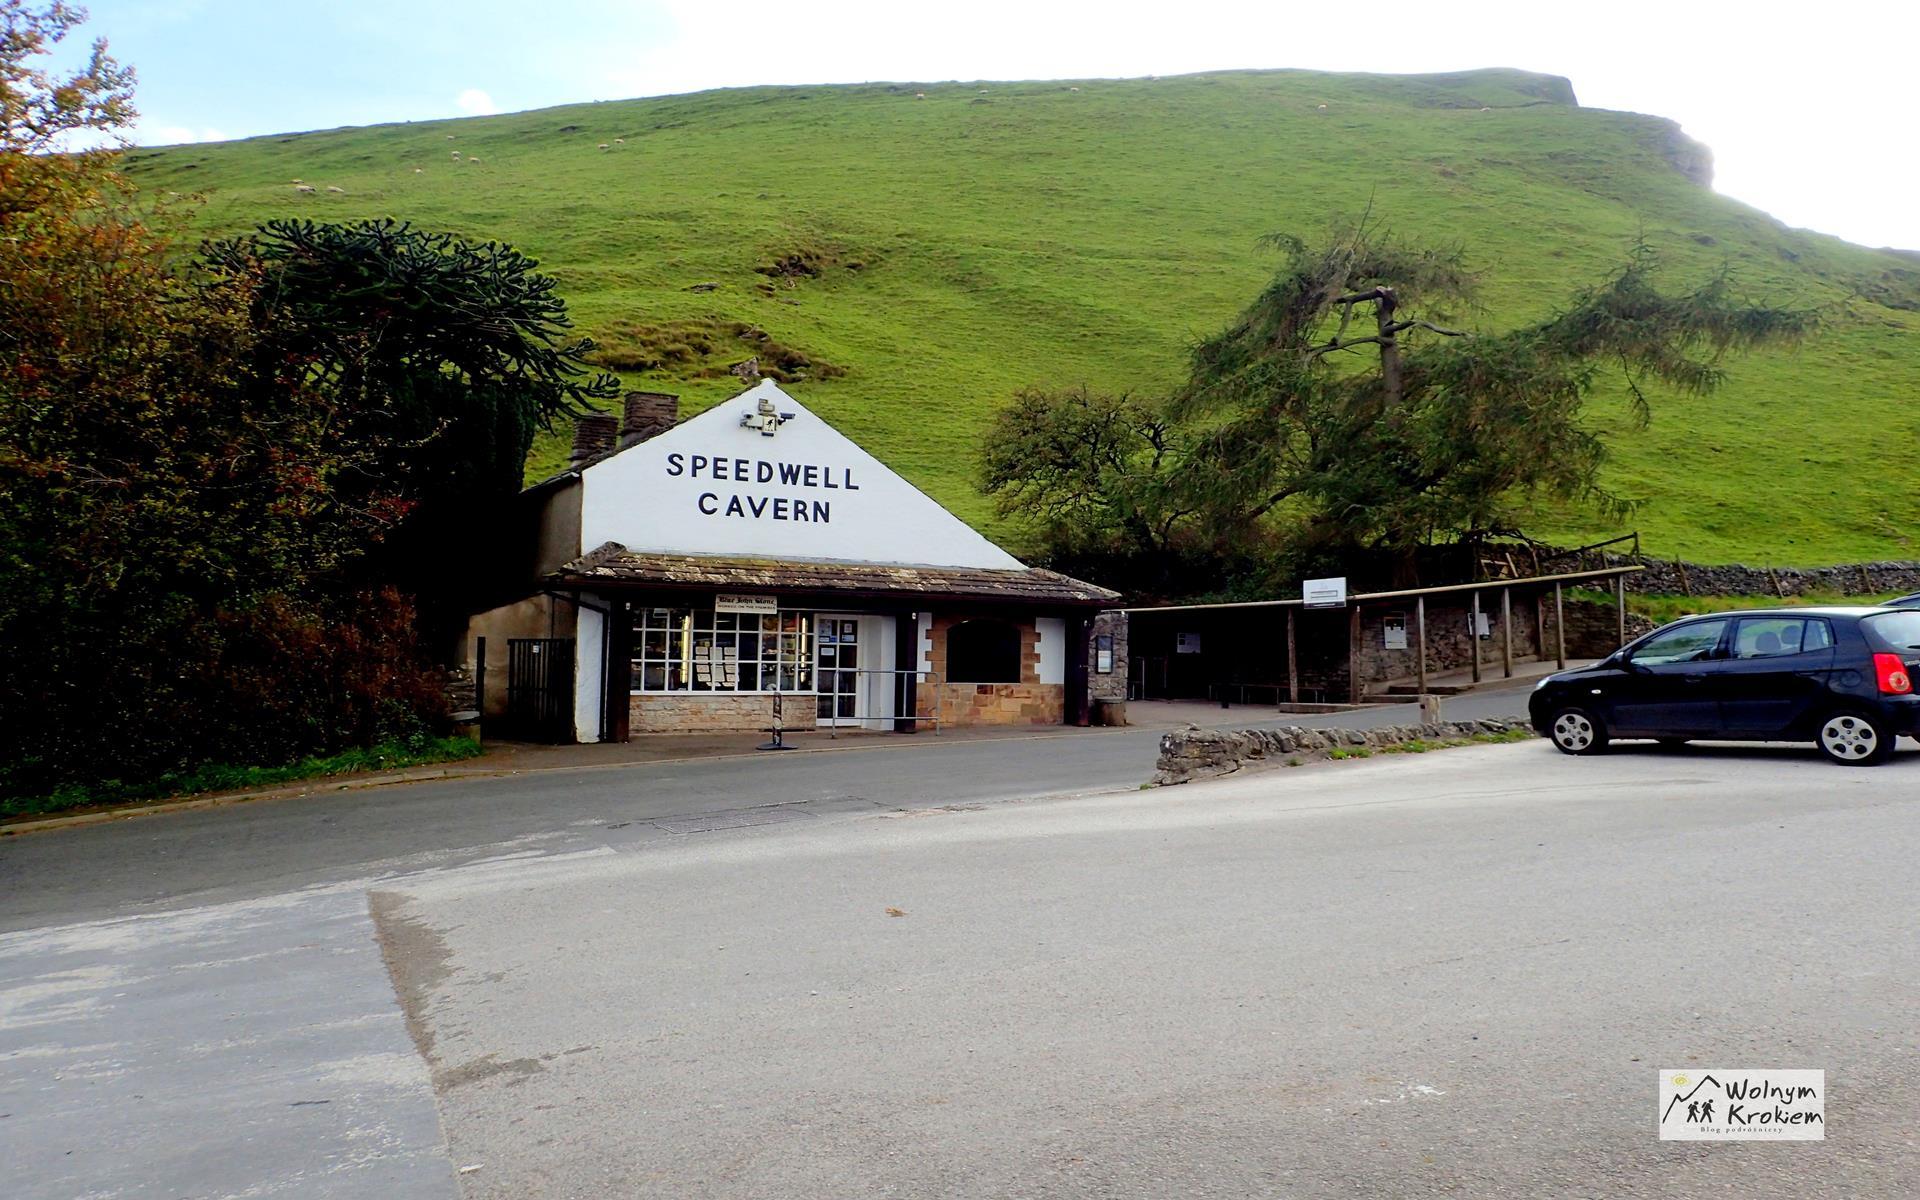 Peak District Jaskinia Speedwell Cavern